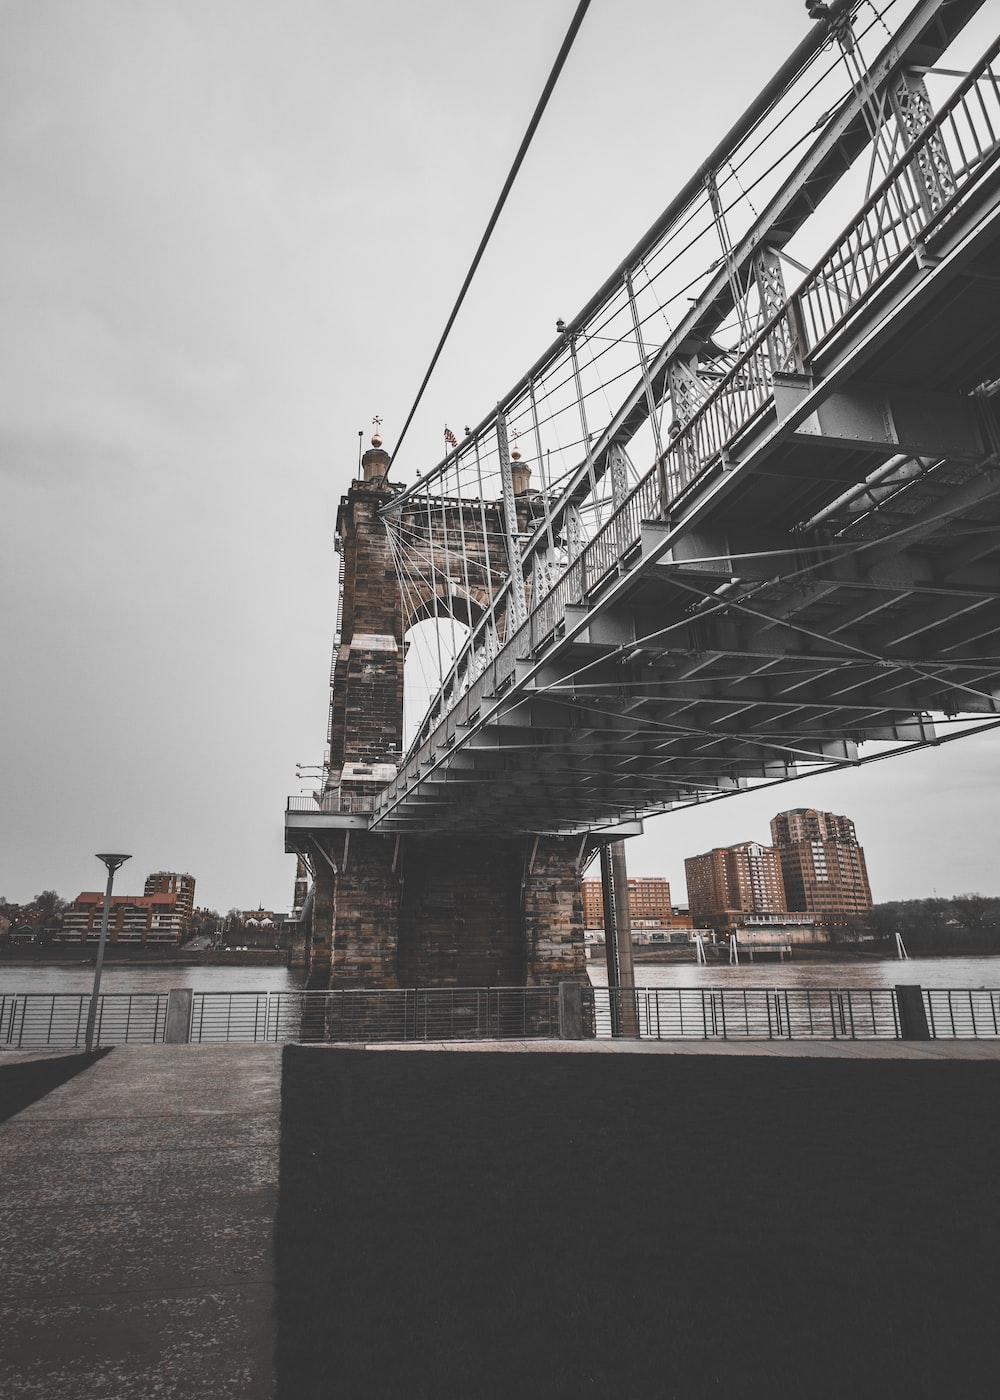 gray and brown bridge